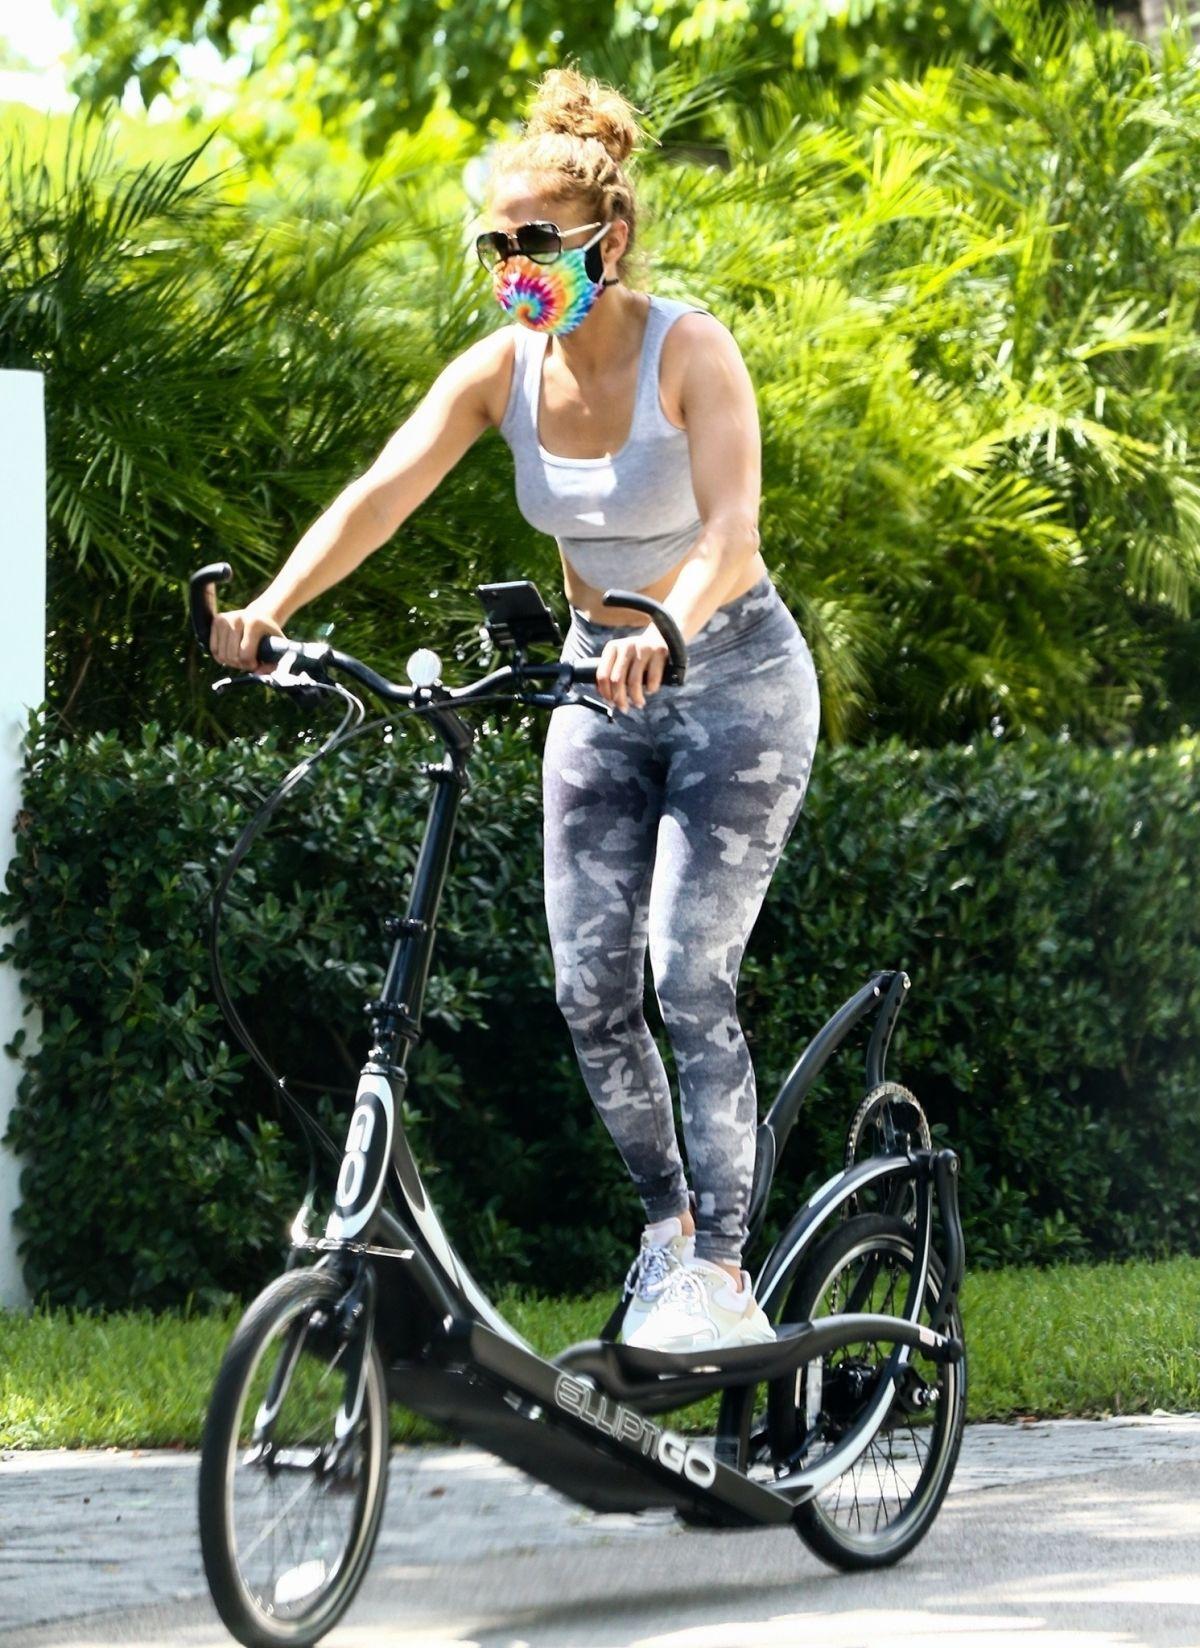 jennifer-lopez-working-out-on-her-elliptigo-bike-july-12-2020